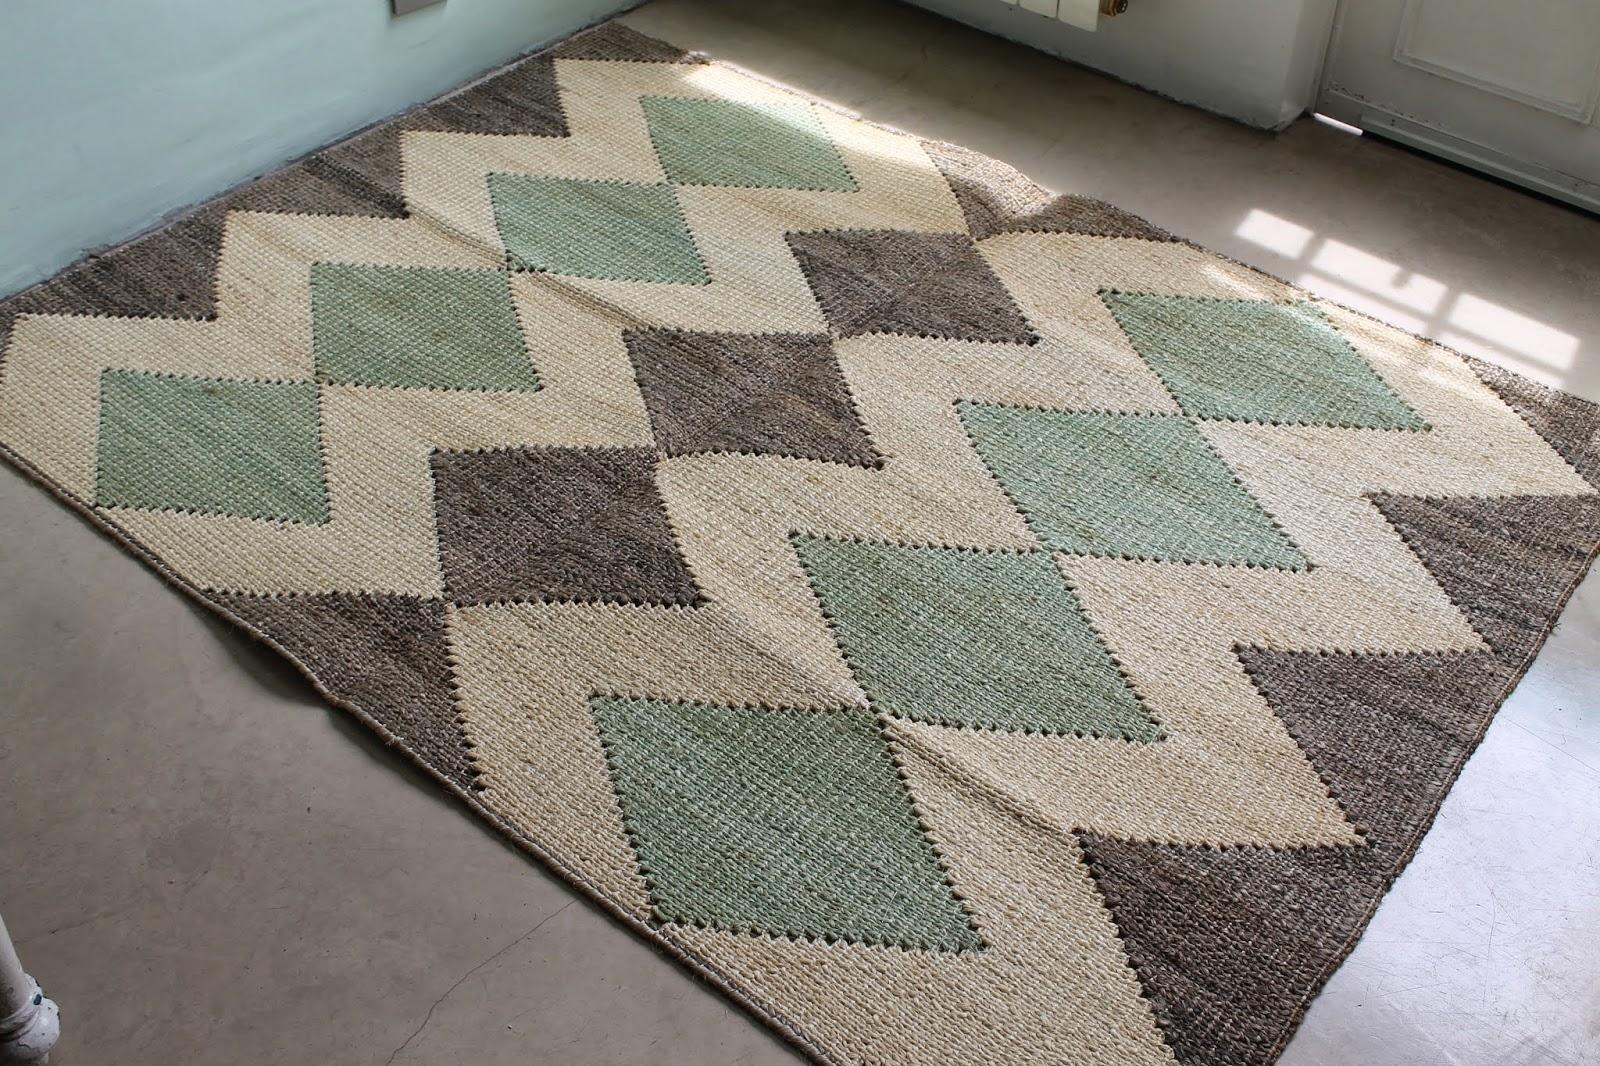 alfombras dise o geom trico grandes deco marce tienda